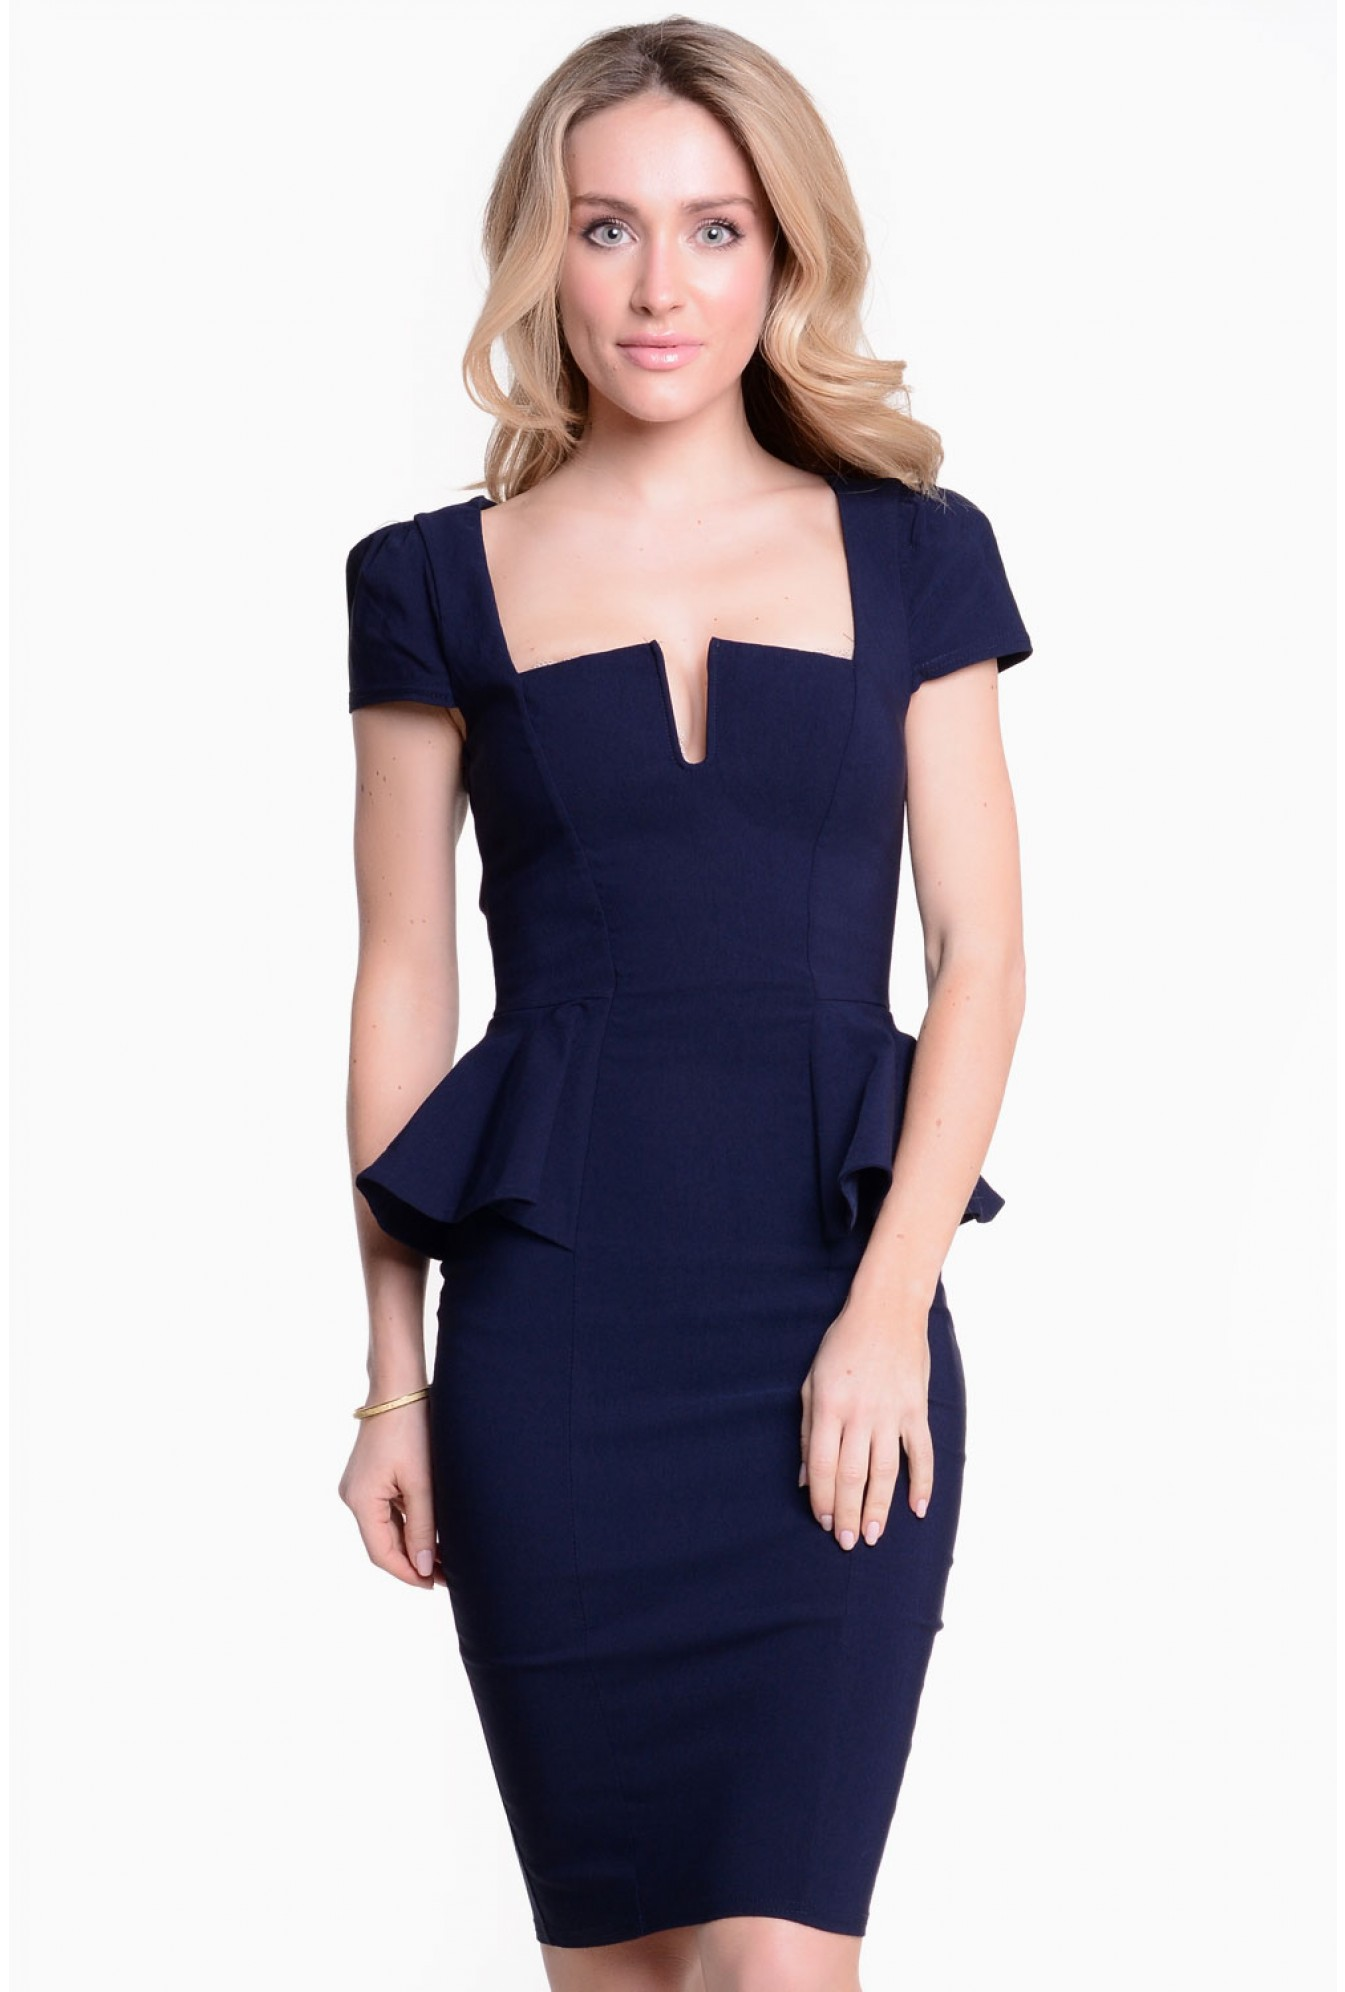 ee1df42a82 Goddiva Jennifer Side Peplum Midi Dress in Navy